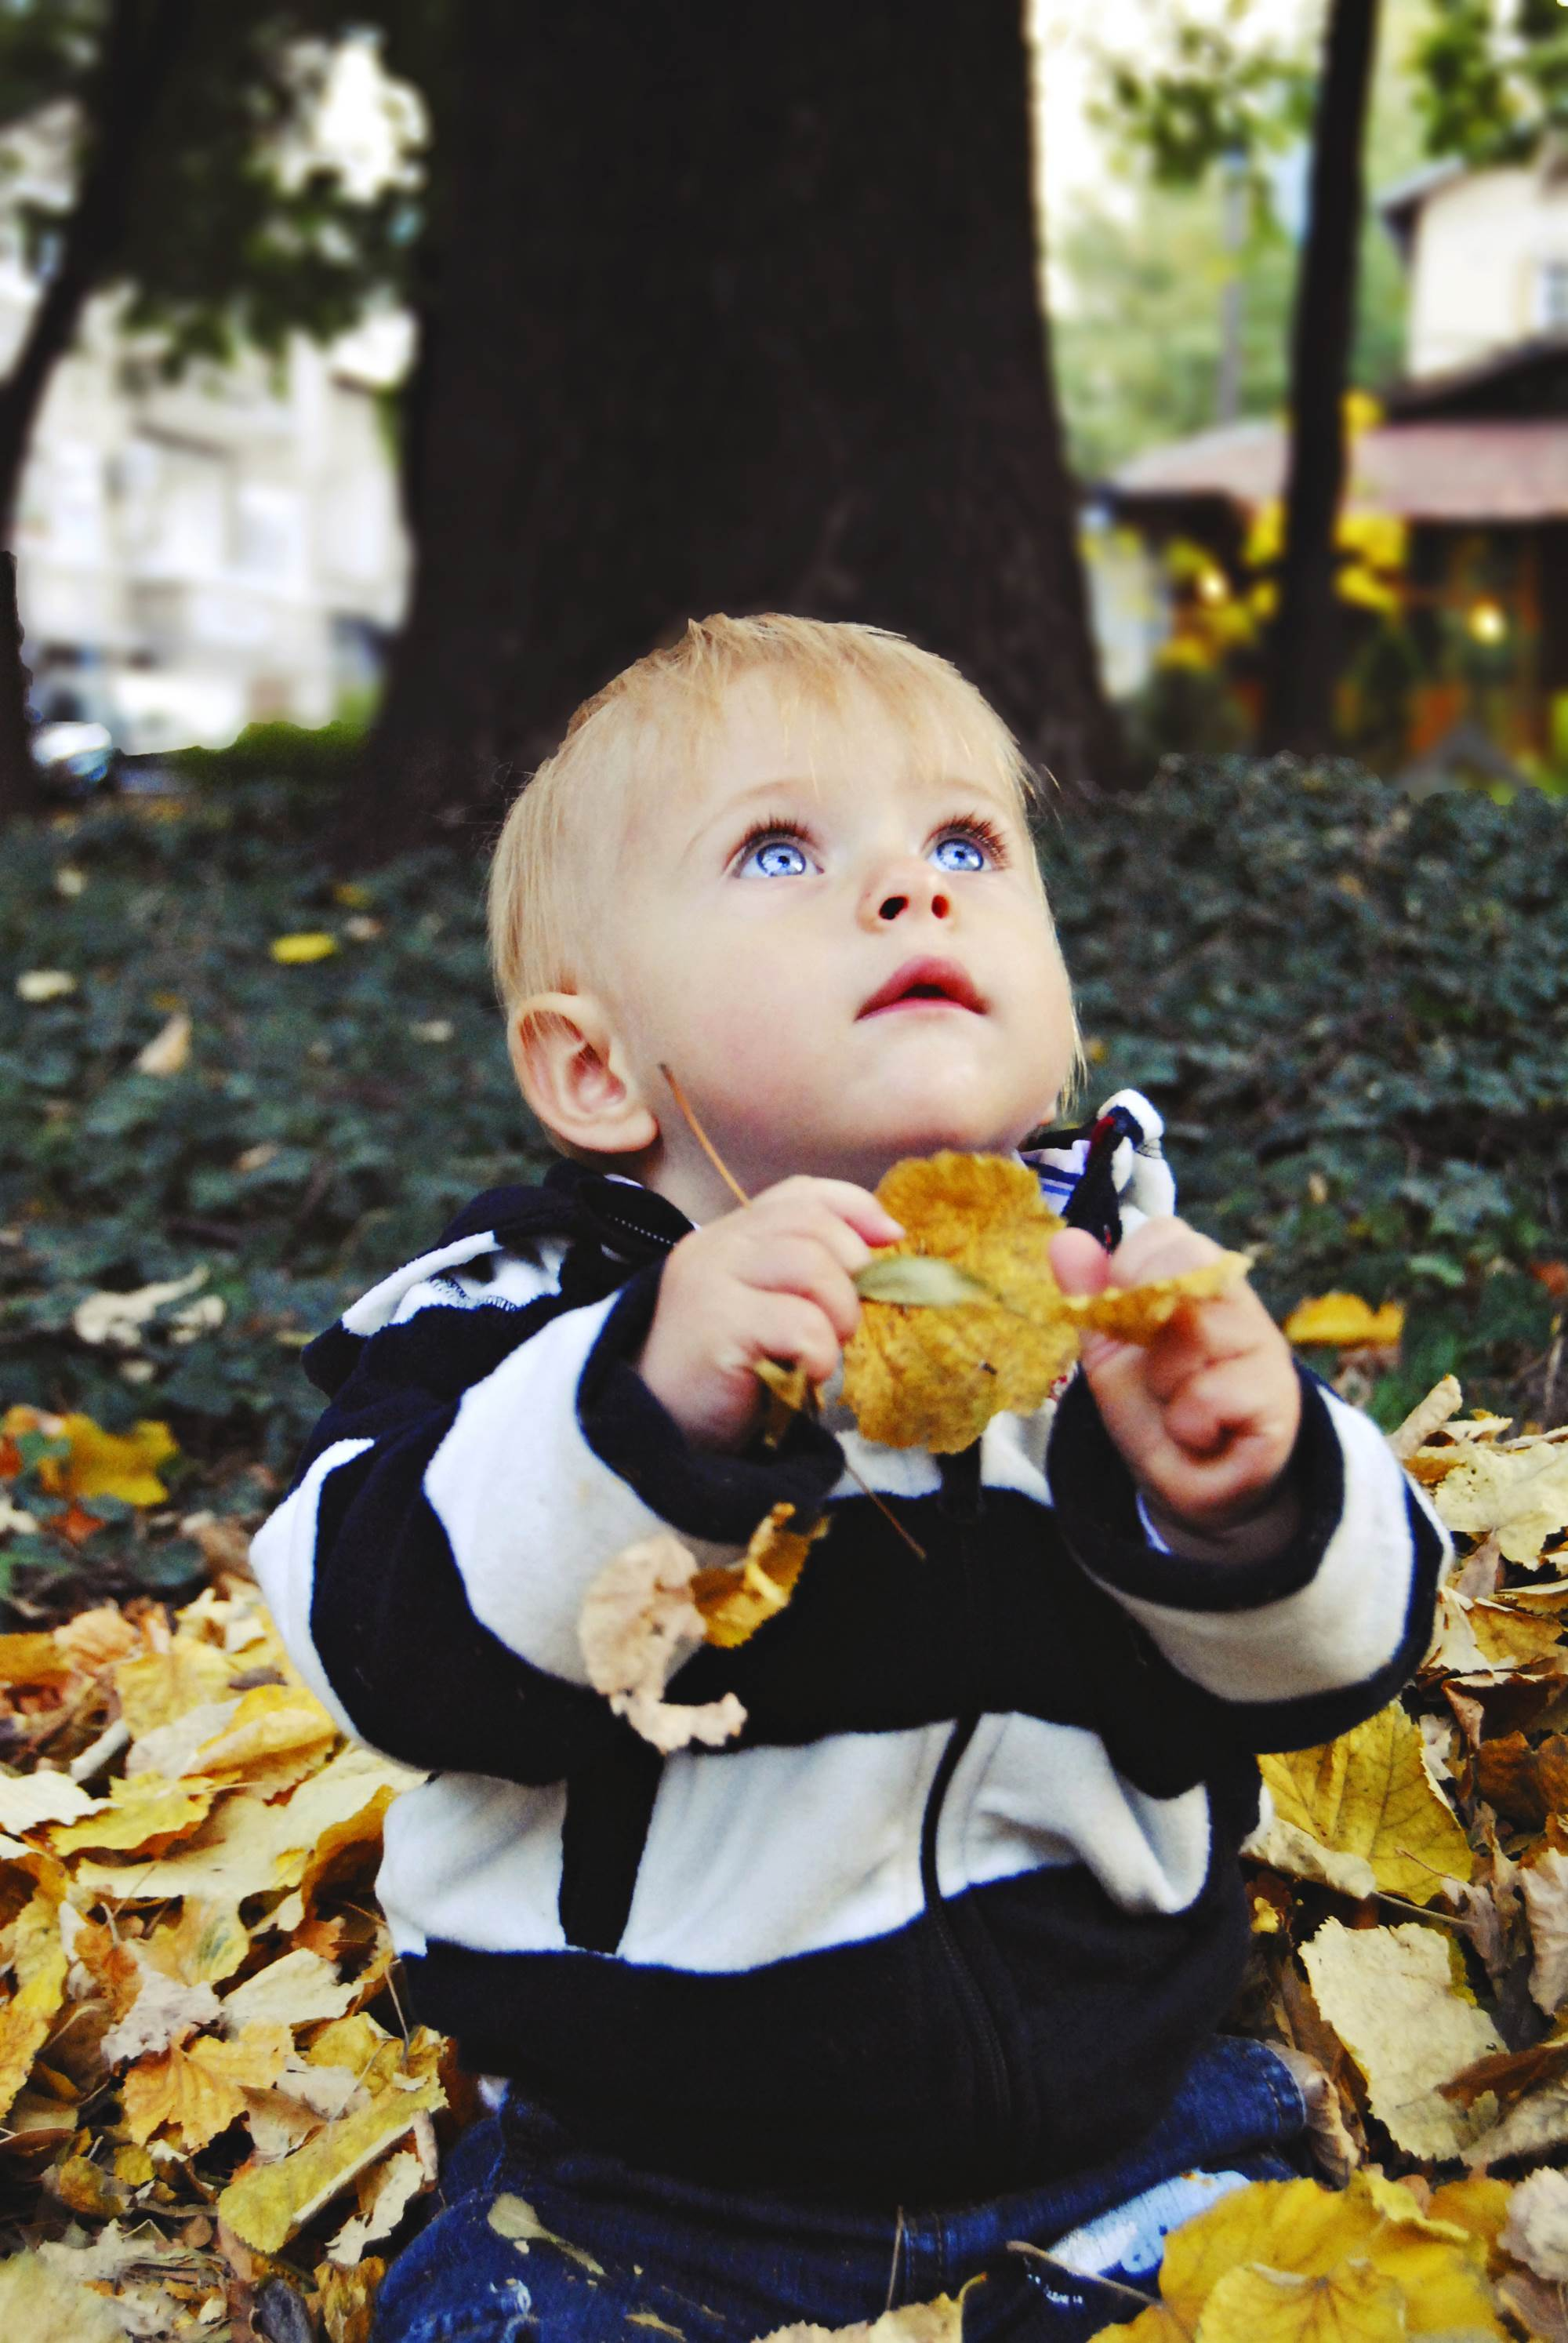 Дете си играе с листа, детска фотография